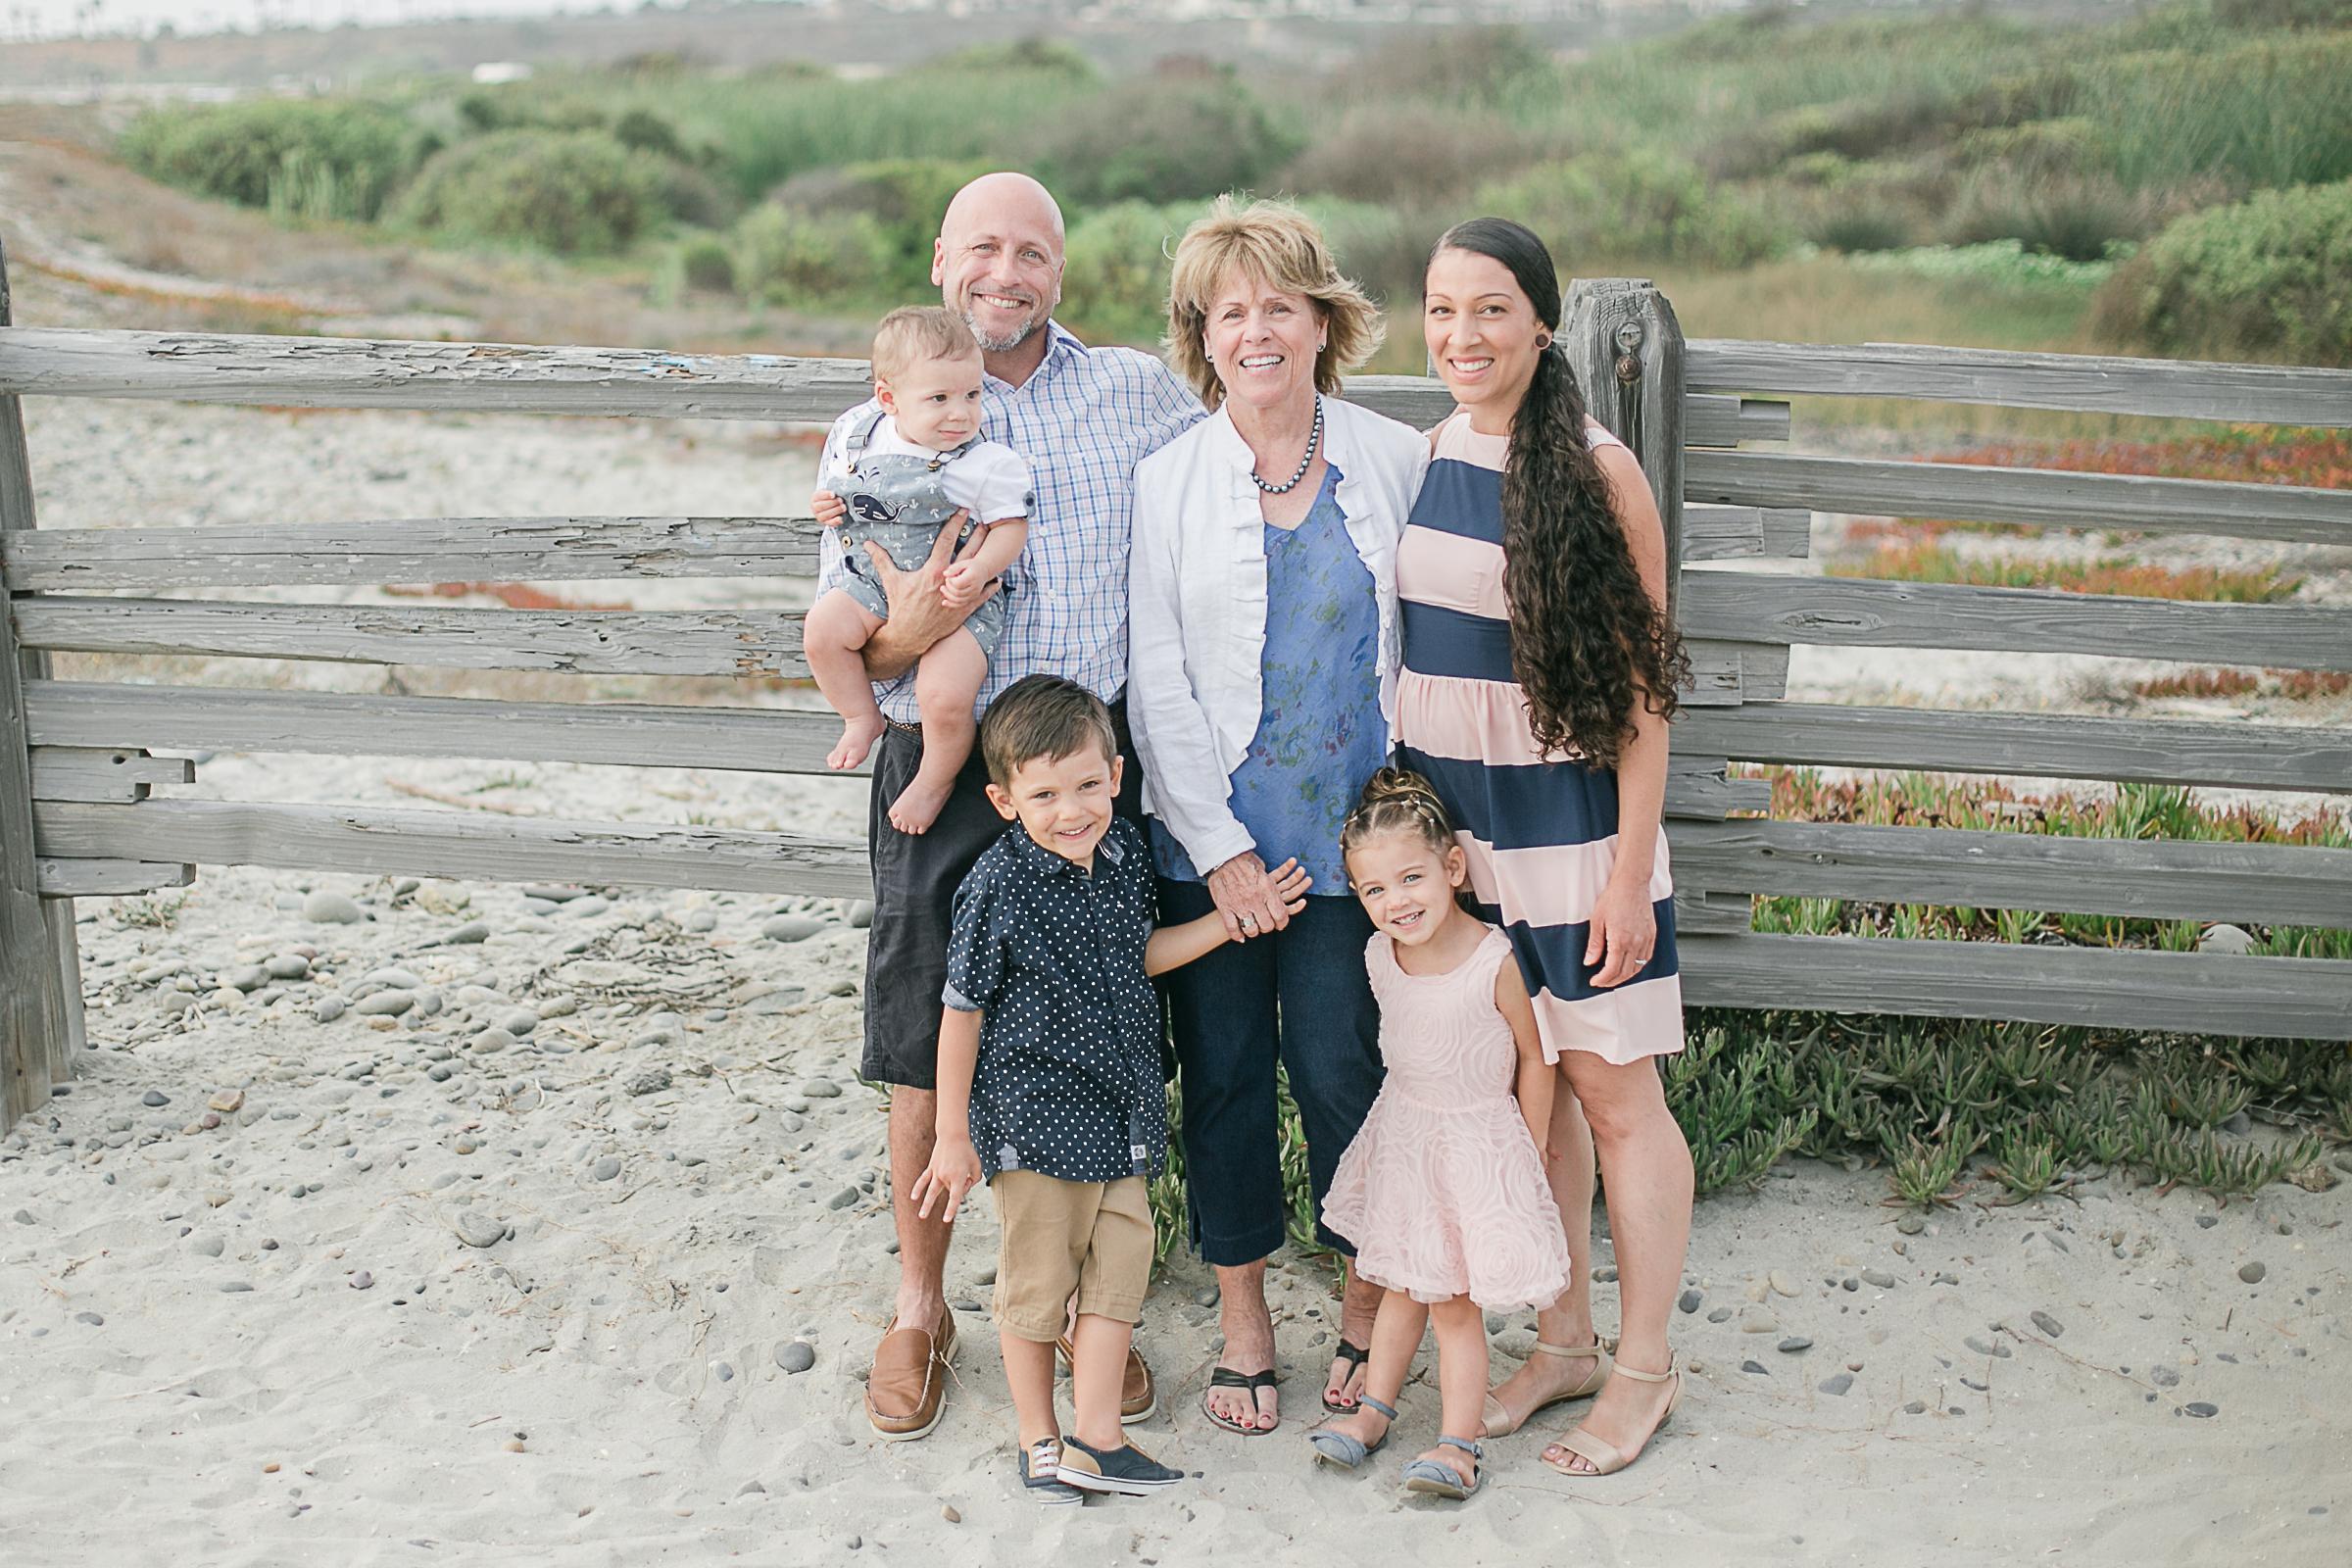 South_Ponto_Beach_Family_Session_2017-5.jpg